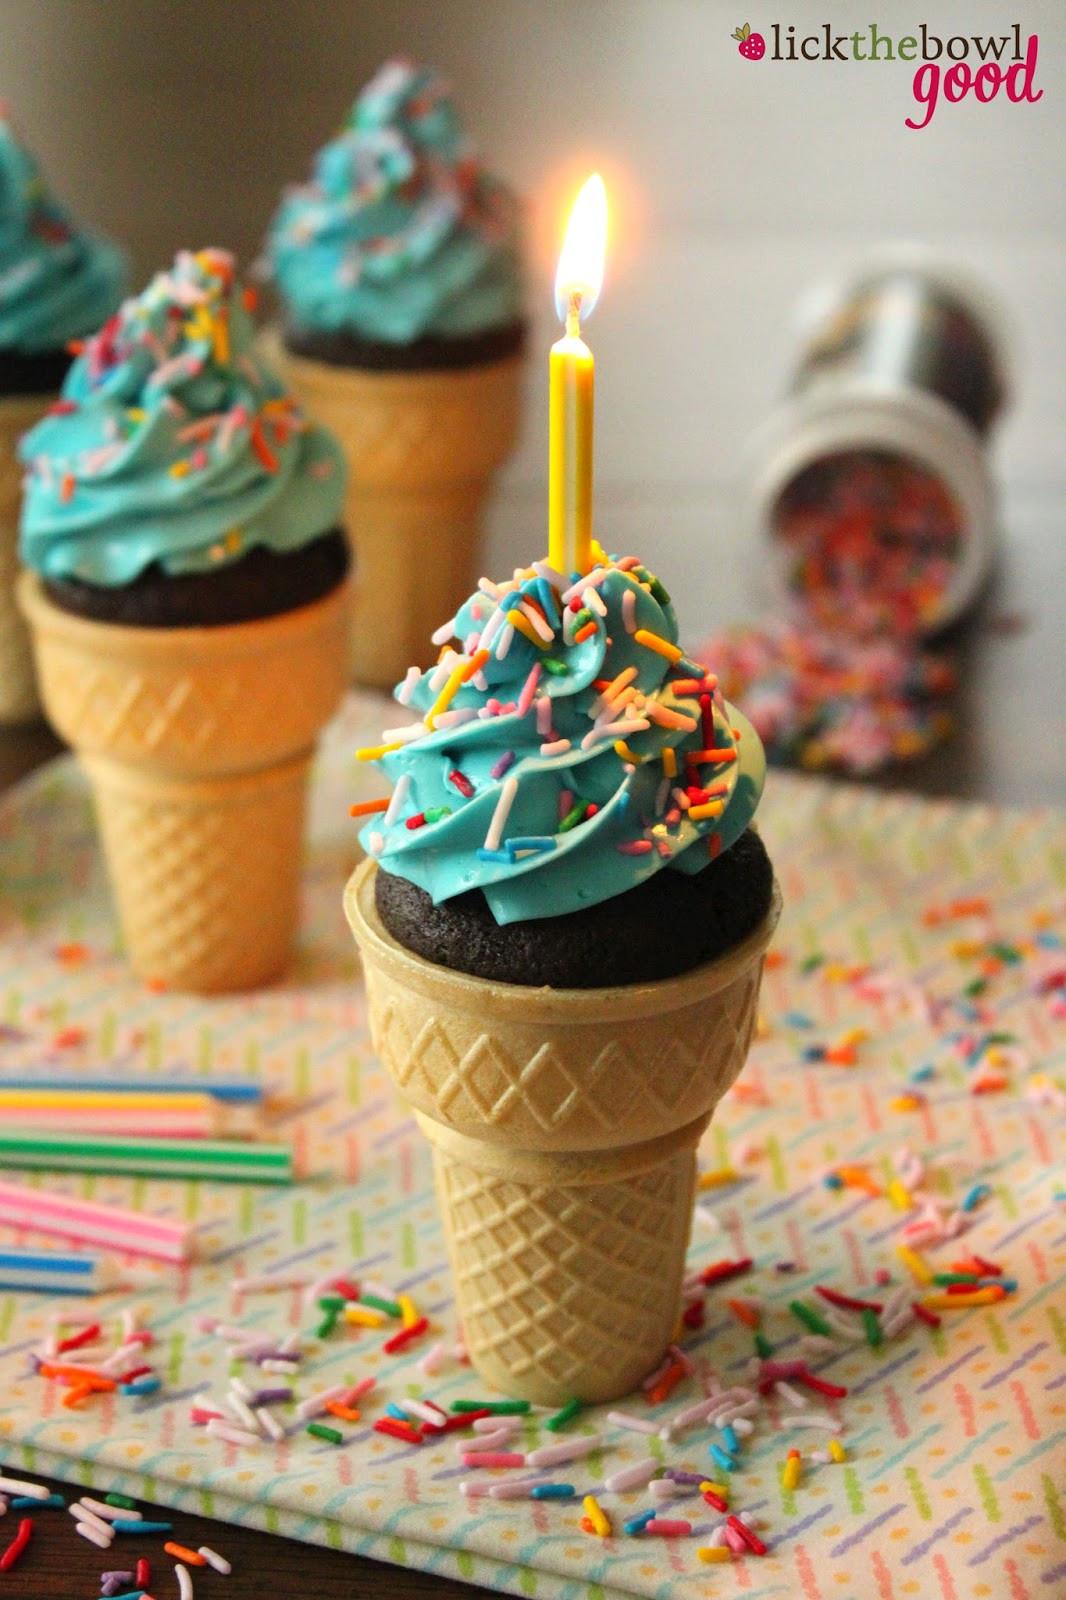 Ice Cream Cone Cupcakes  Lick The Bowl Good Ice Cream Cone Cupcakes & The